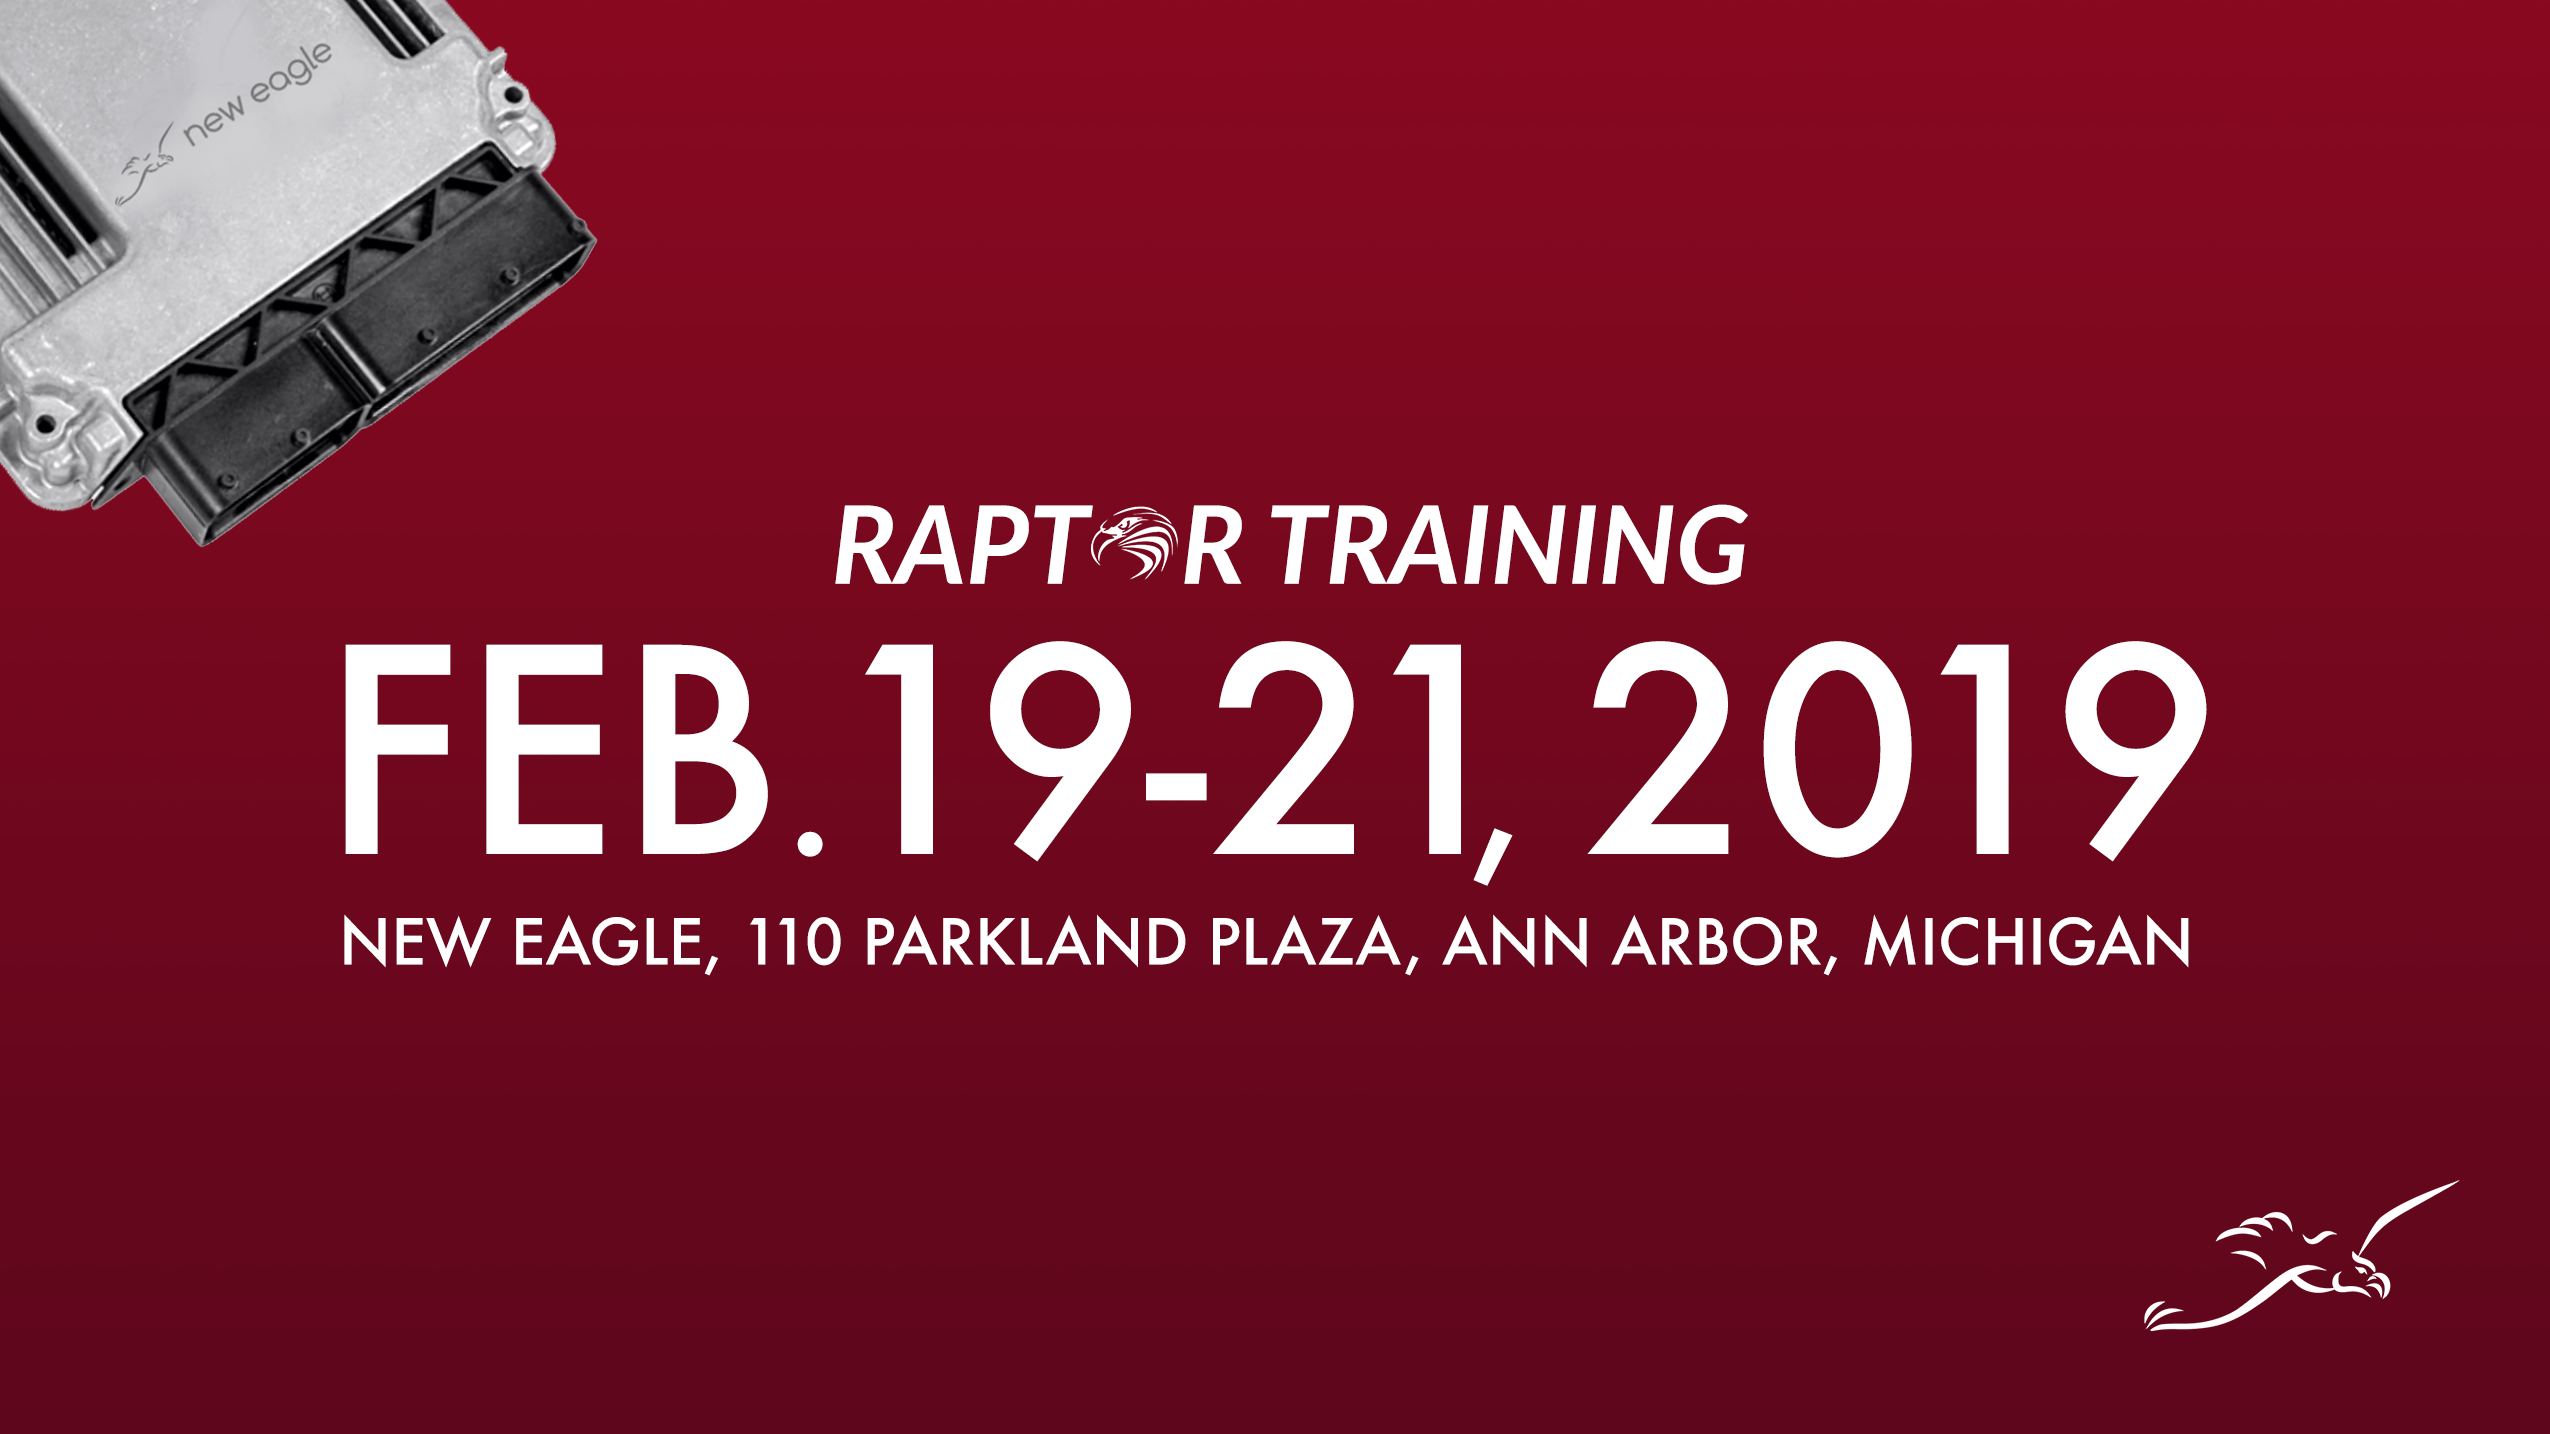 raptor-training